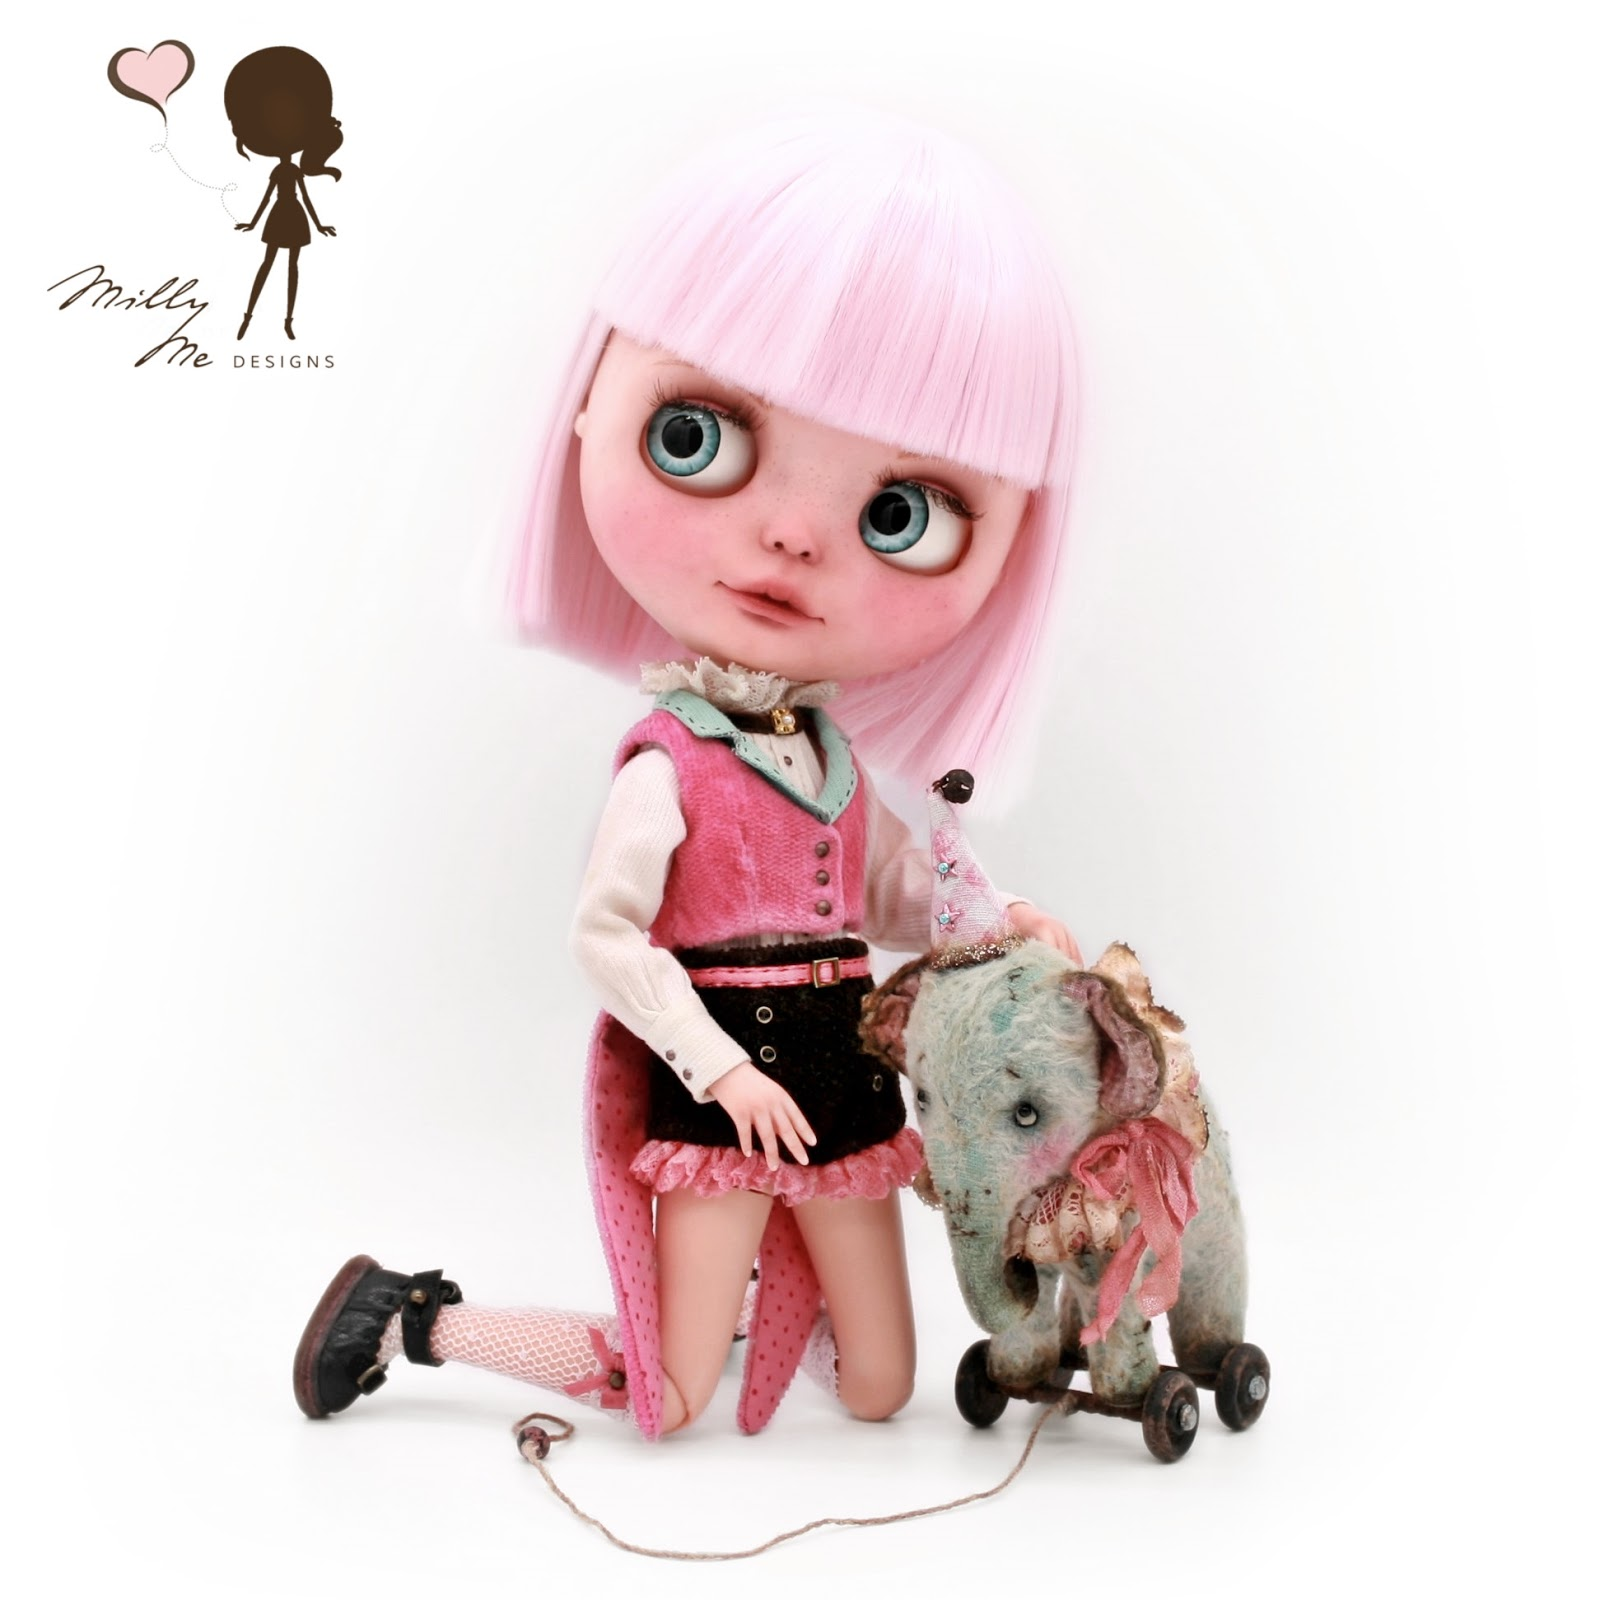 milly me designs, blythe, blythe doll, blythe dress, blythe outfit, blythe clothes